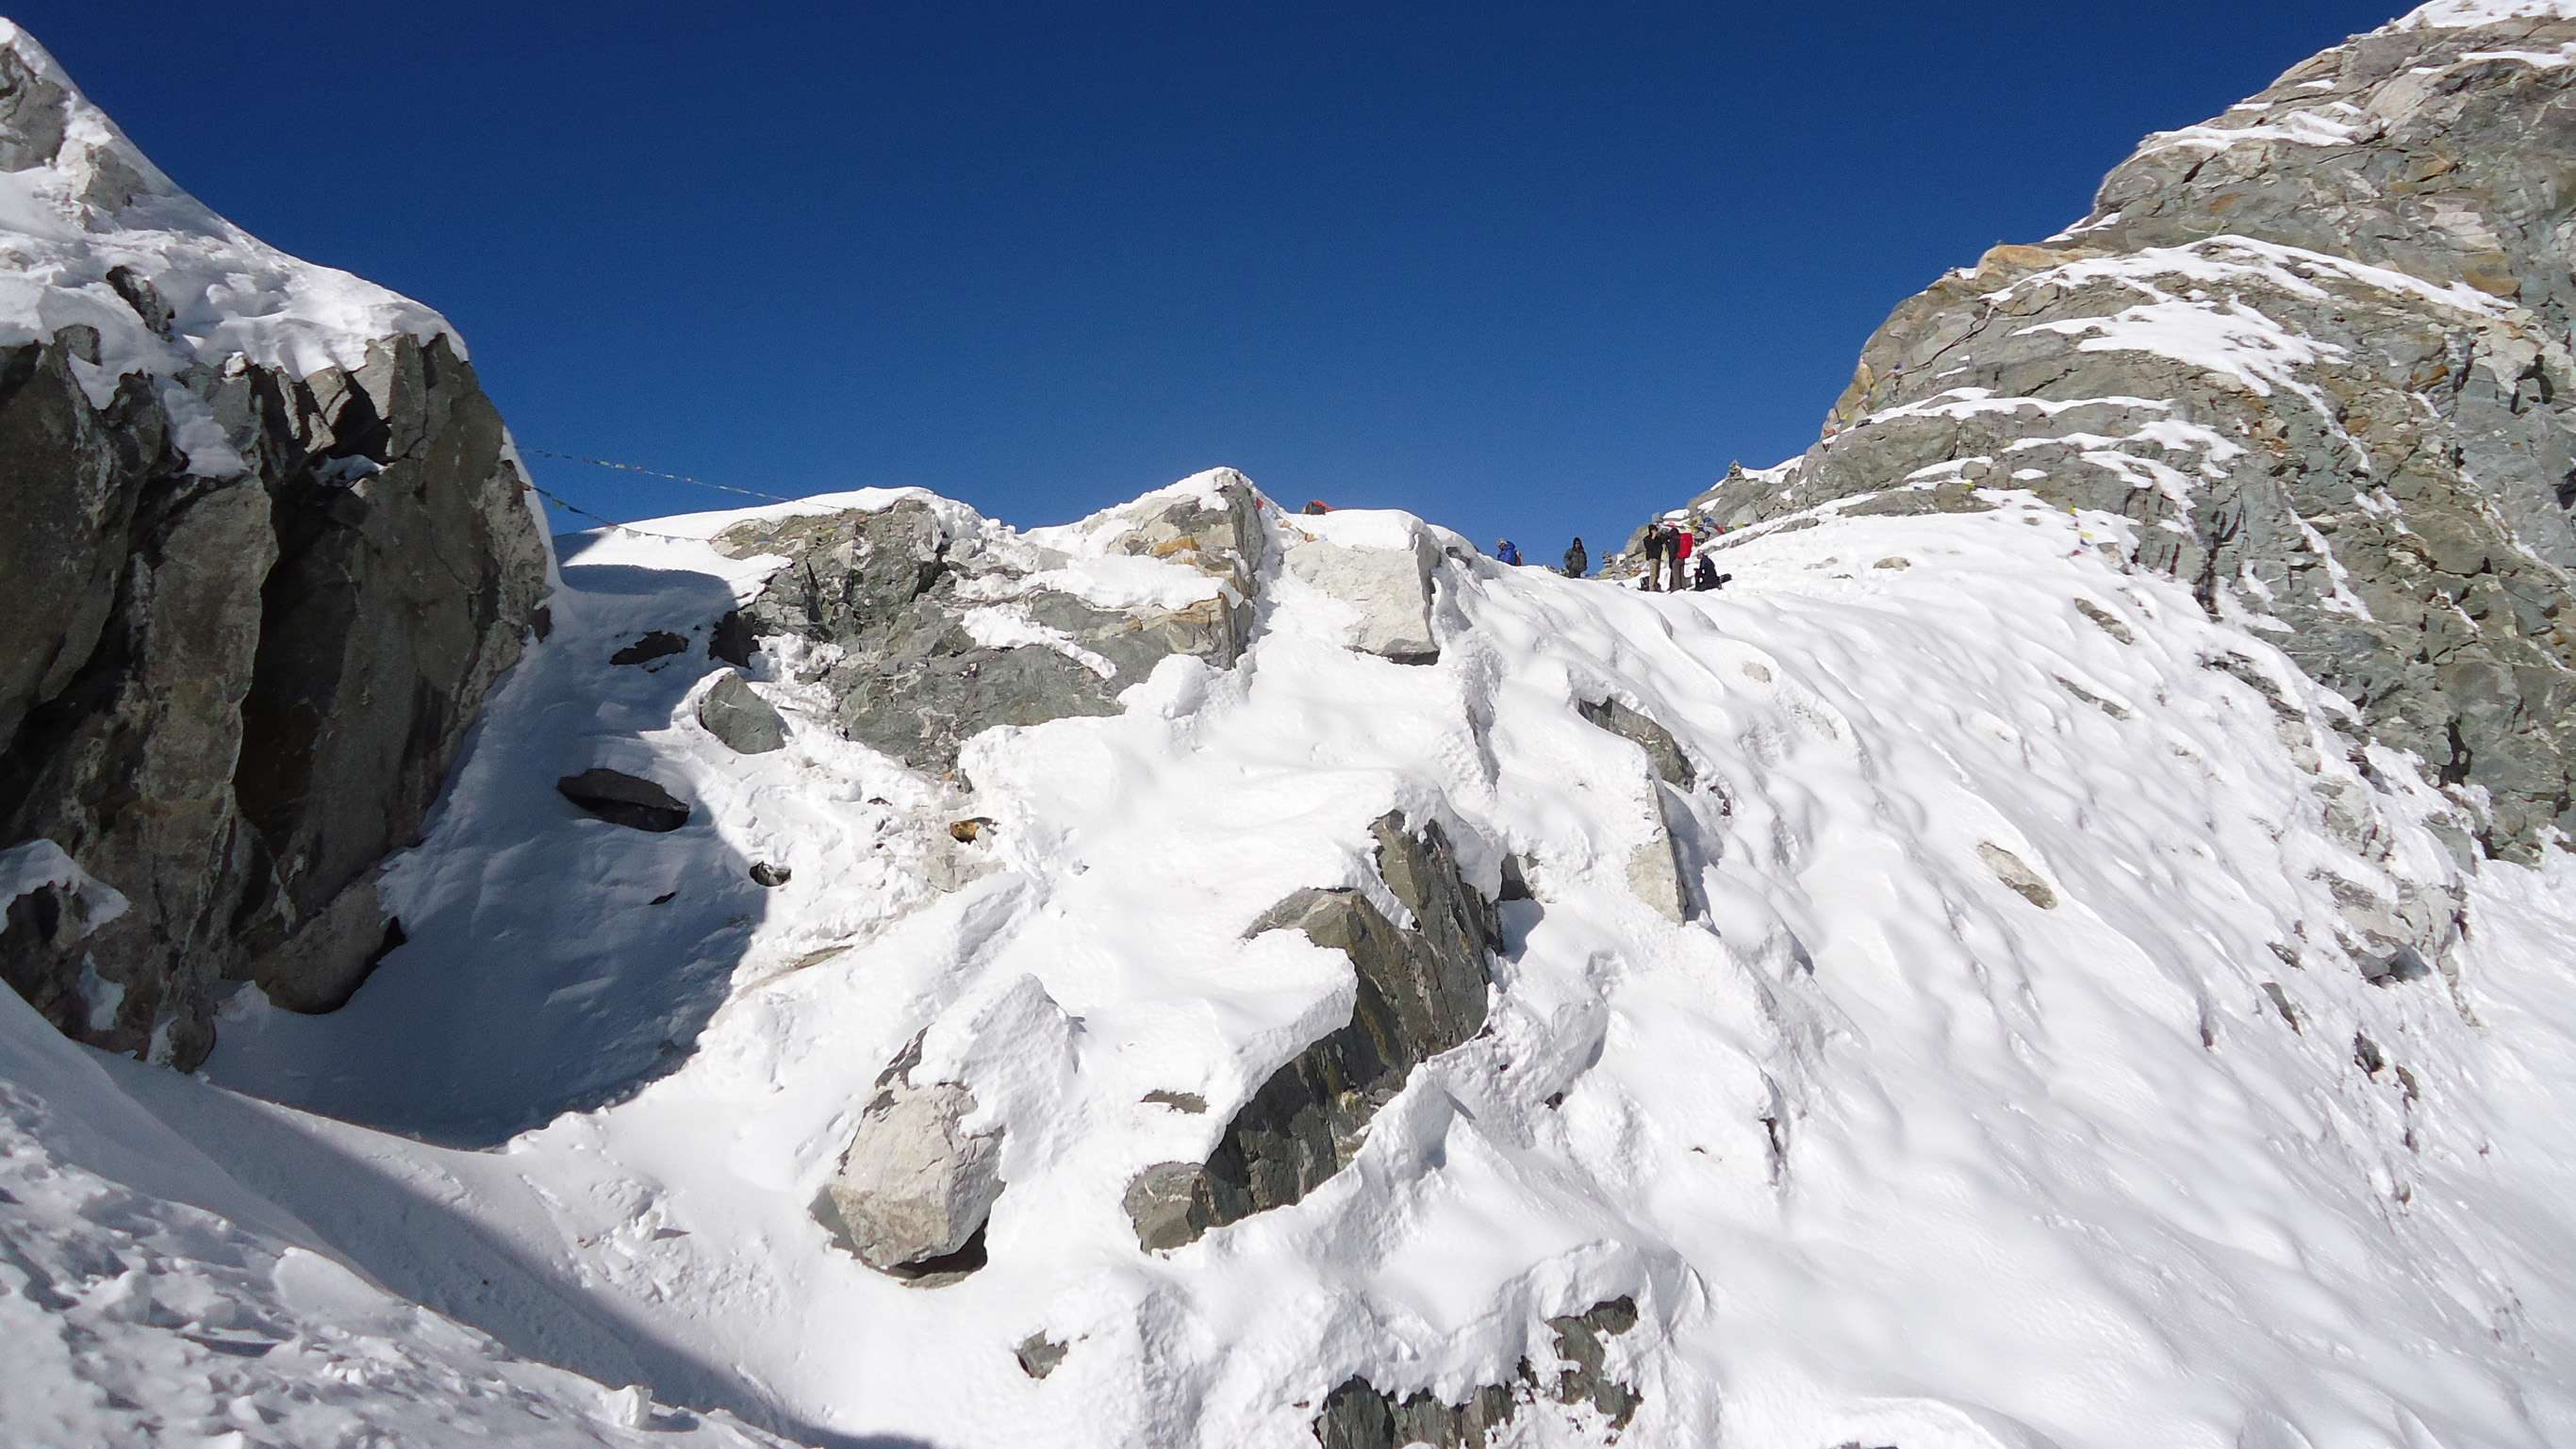 17-Day Everest Base Camp with Gokyo and Cho-La Pass - Nepal Itinerary